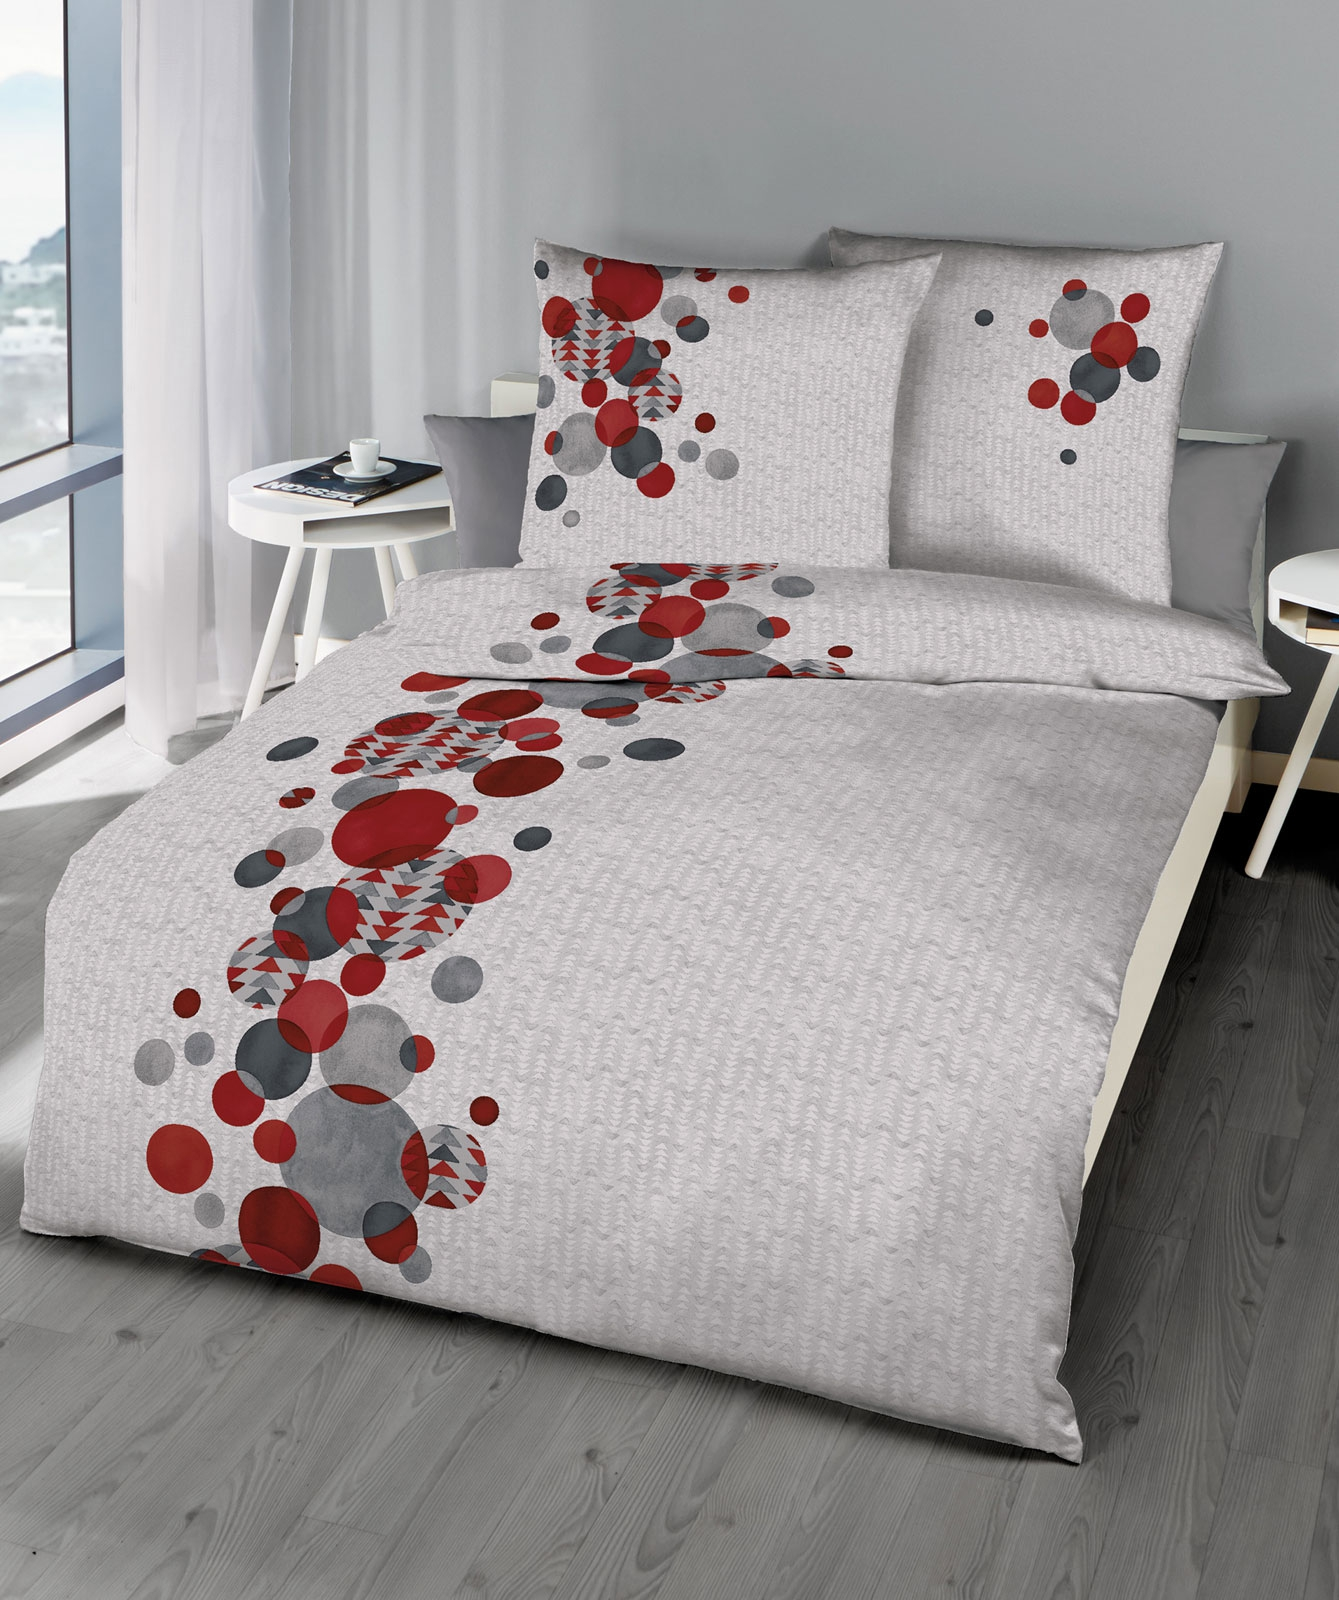 kaeppel mako satin bettw sche global 710 602 135x200 rot aufbewahrungsbeutel ebay. Black Bedroom Furniture Sets. Home Design Ideas